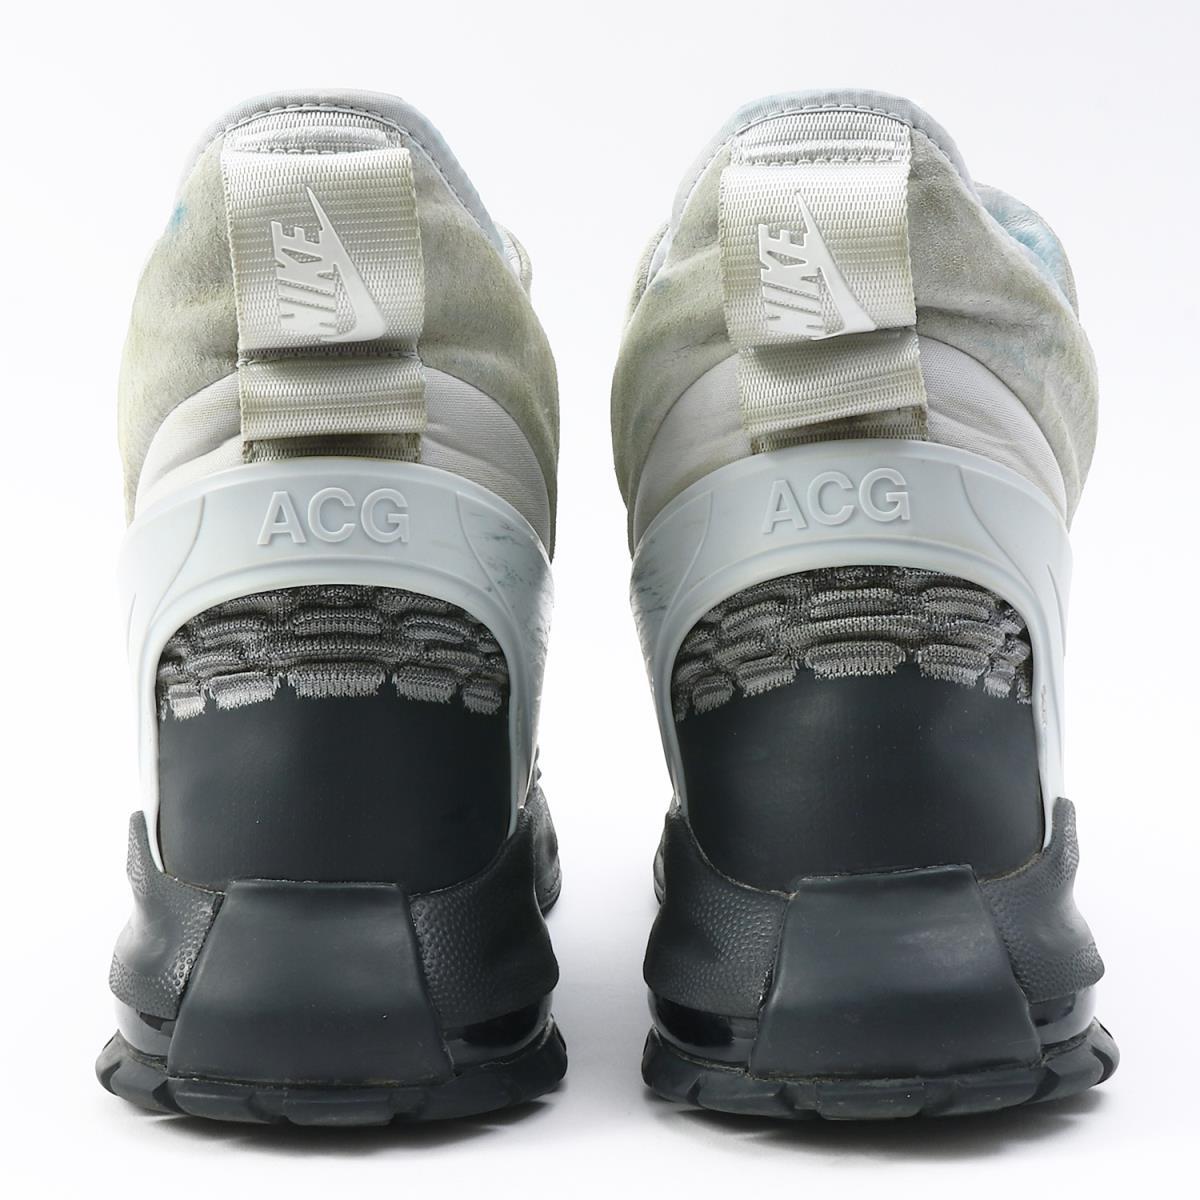 promo code 02769 bef5a NIKE (Nike) NikeLab ACG ZOOM TALLAC FLYKNIT (865,947-003) black X white  US8.5(26.5cm)